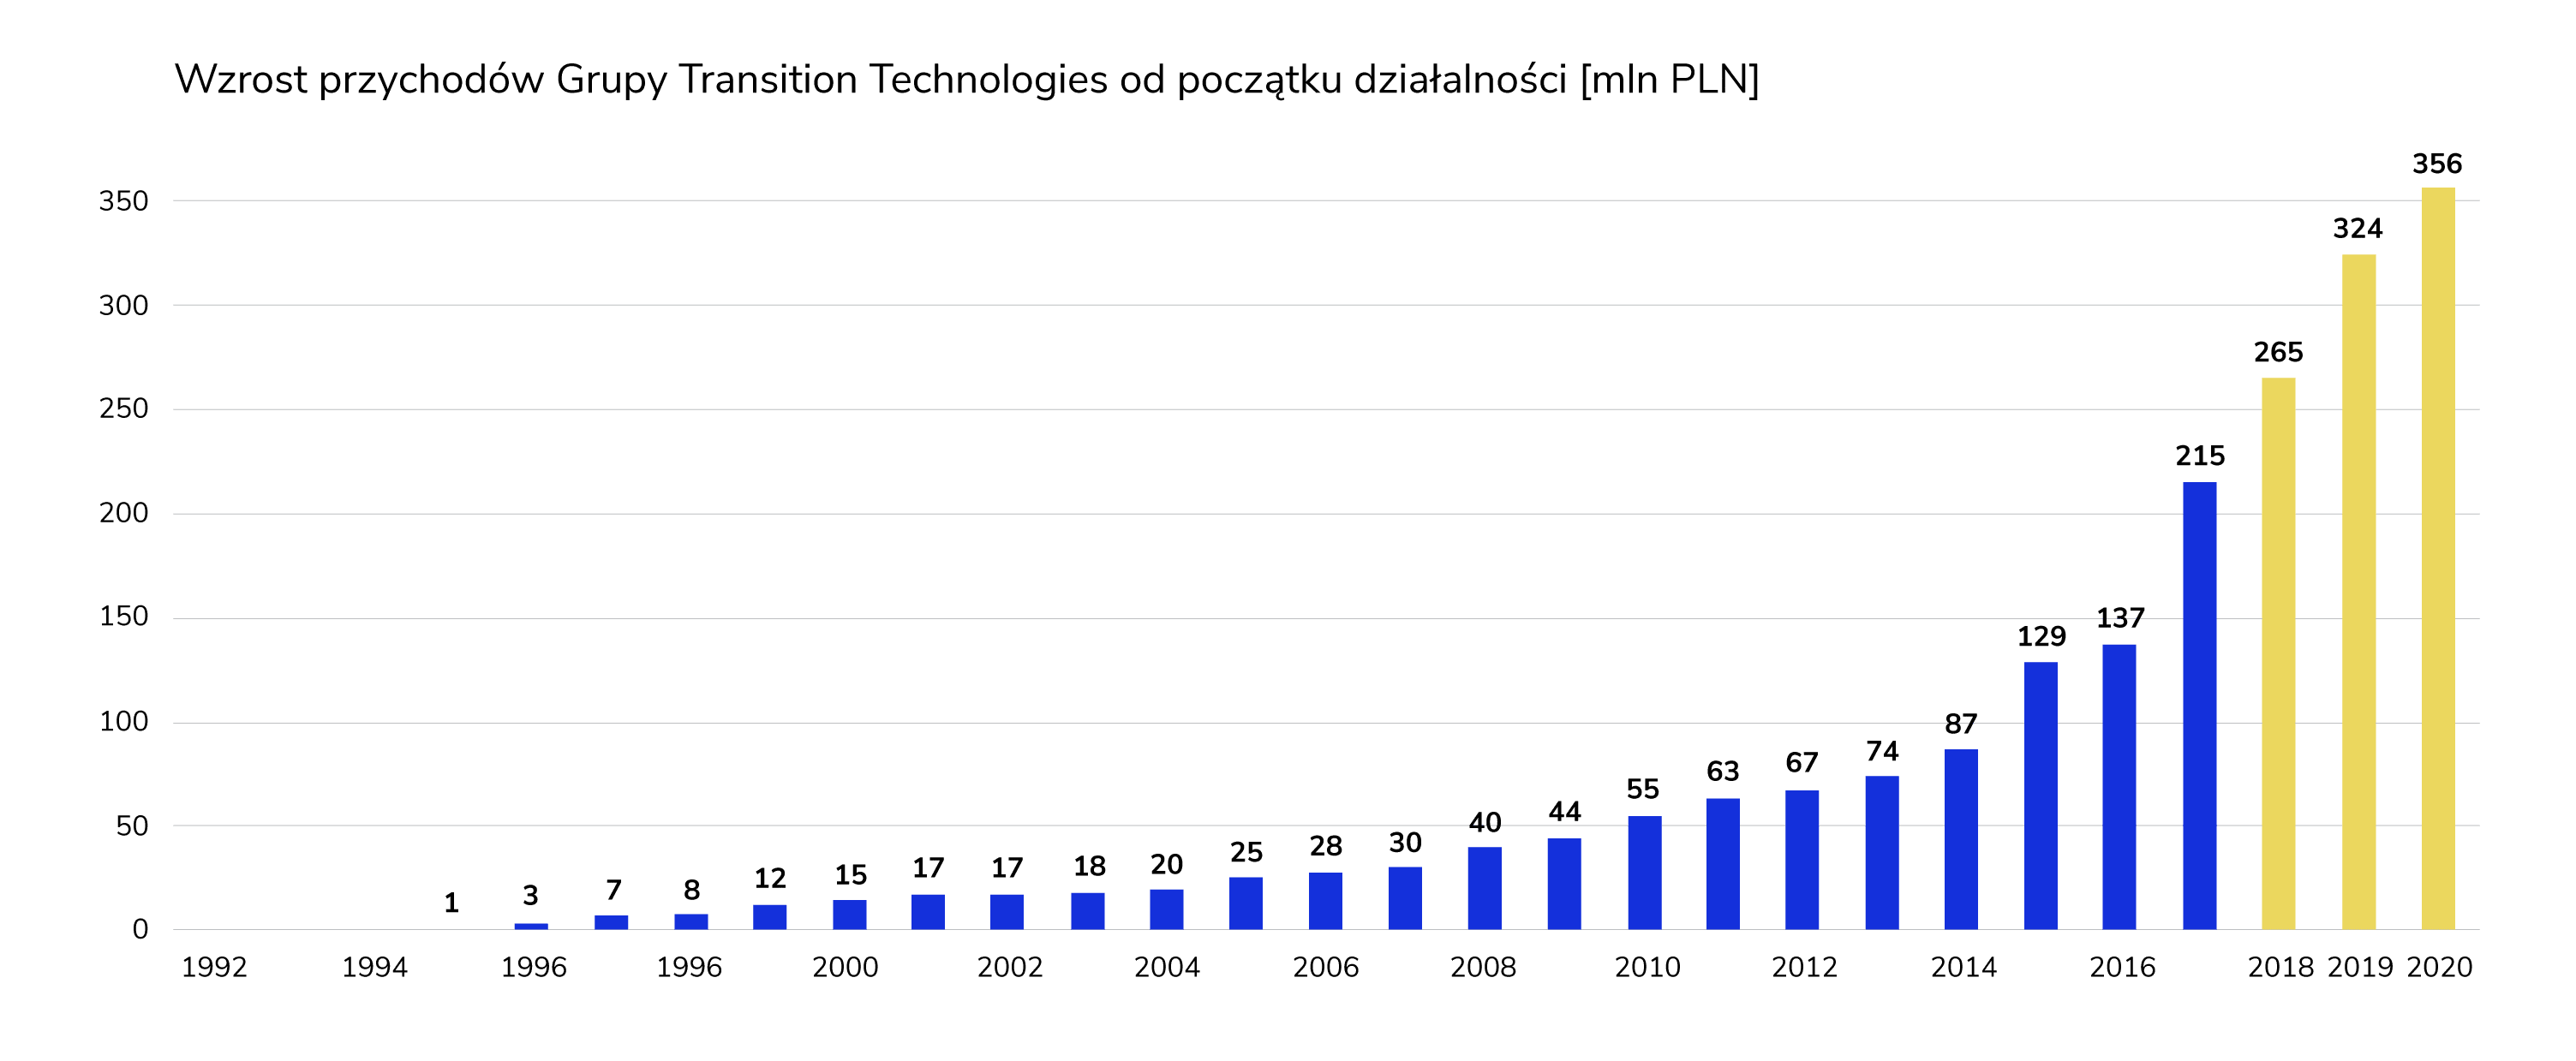 Transition Technologies grafika